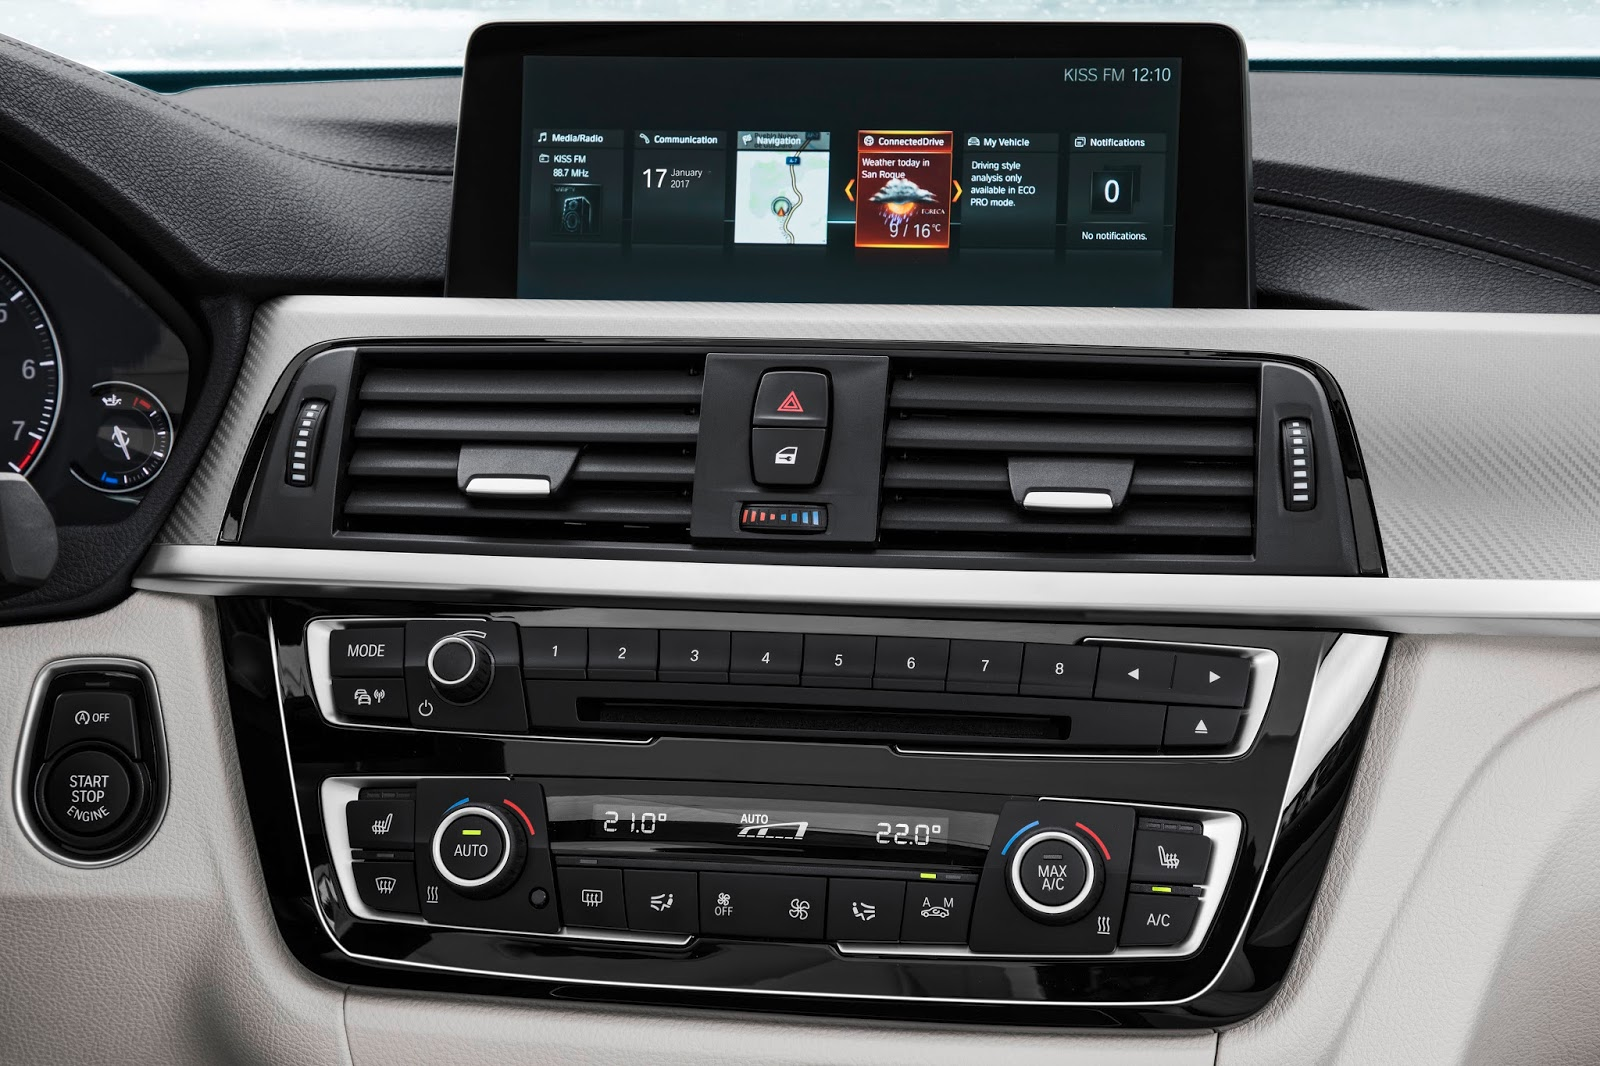 P90245305 highRes the new bmw series i Η νέα BMW Σειρά 4, με πιο σφιχτή ρύθμιση ανάρτησης BMW, Bmw 4, BMW 4 Cabrio, BMW 4 Coupe, BMW 4 Gran Coupé, Facelift